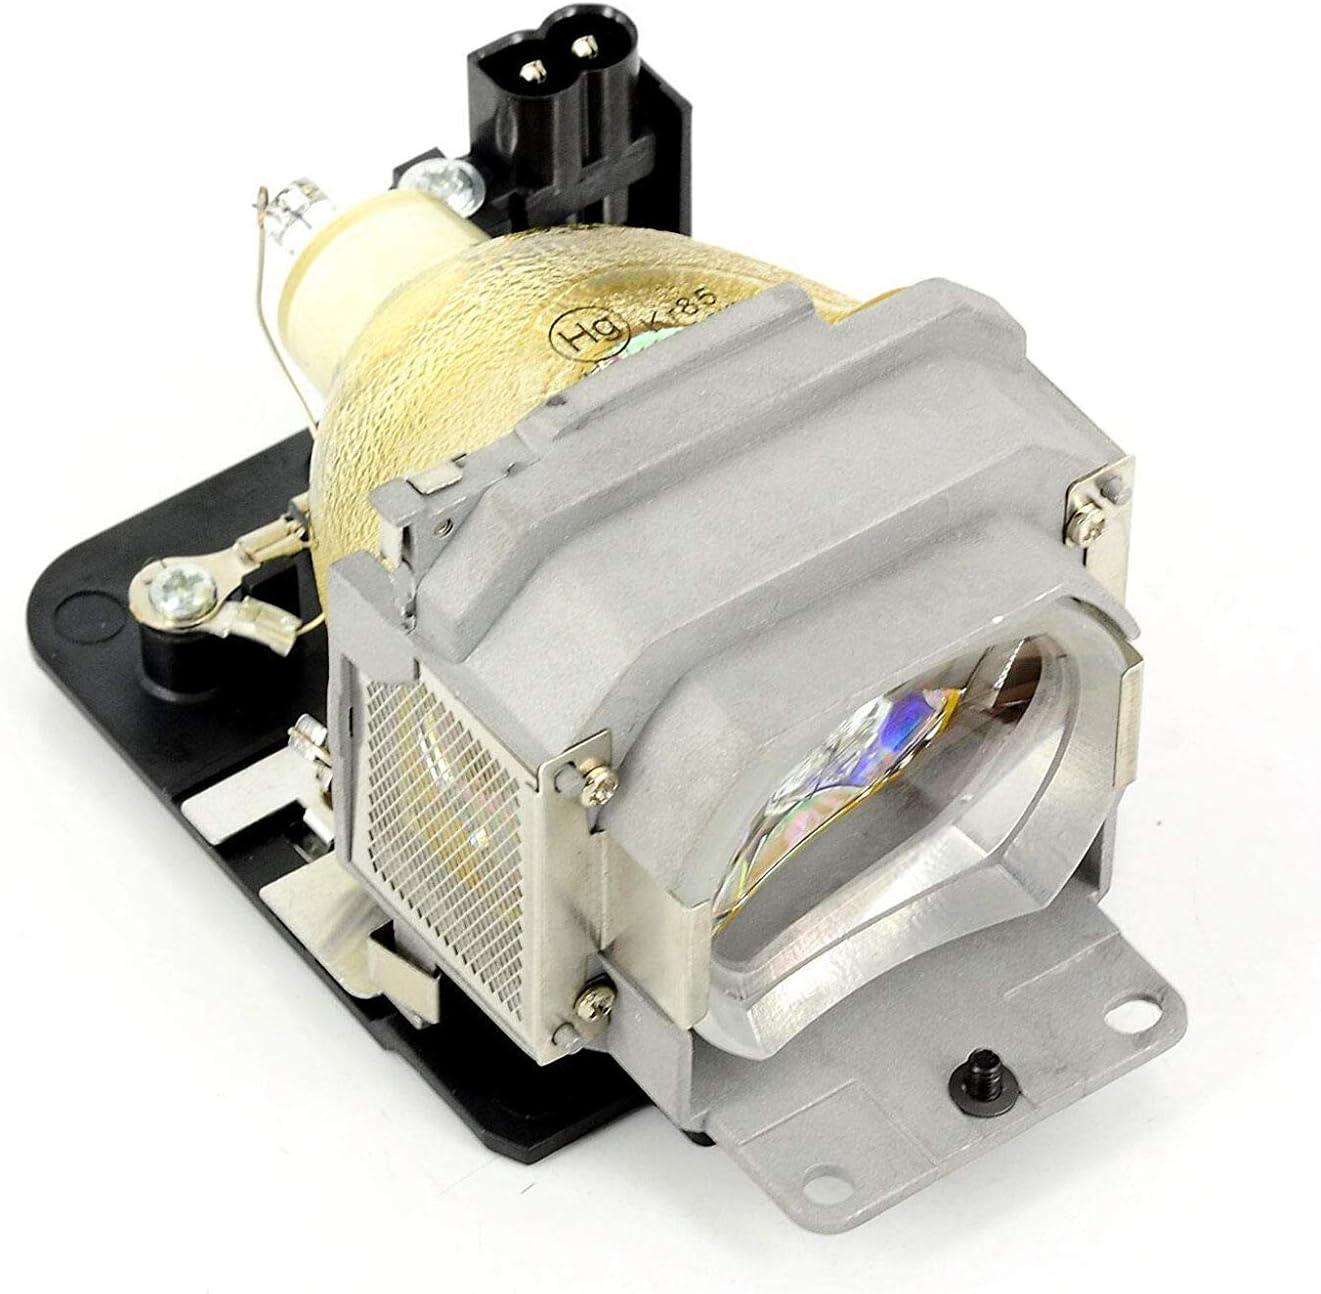 Supermait LMP-E190 Ersatz Projektor Lampe mit Geh/äuse f/ür Sony vpl-es5//EX5//vpl-ex50//vpl-ew5